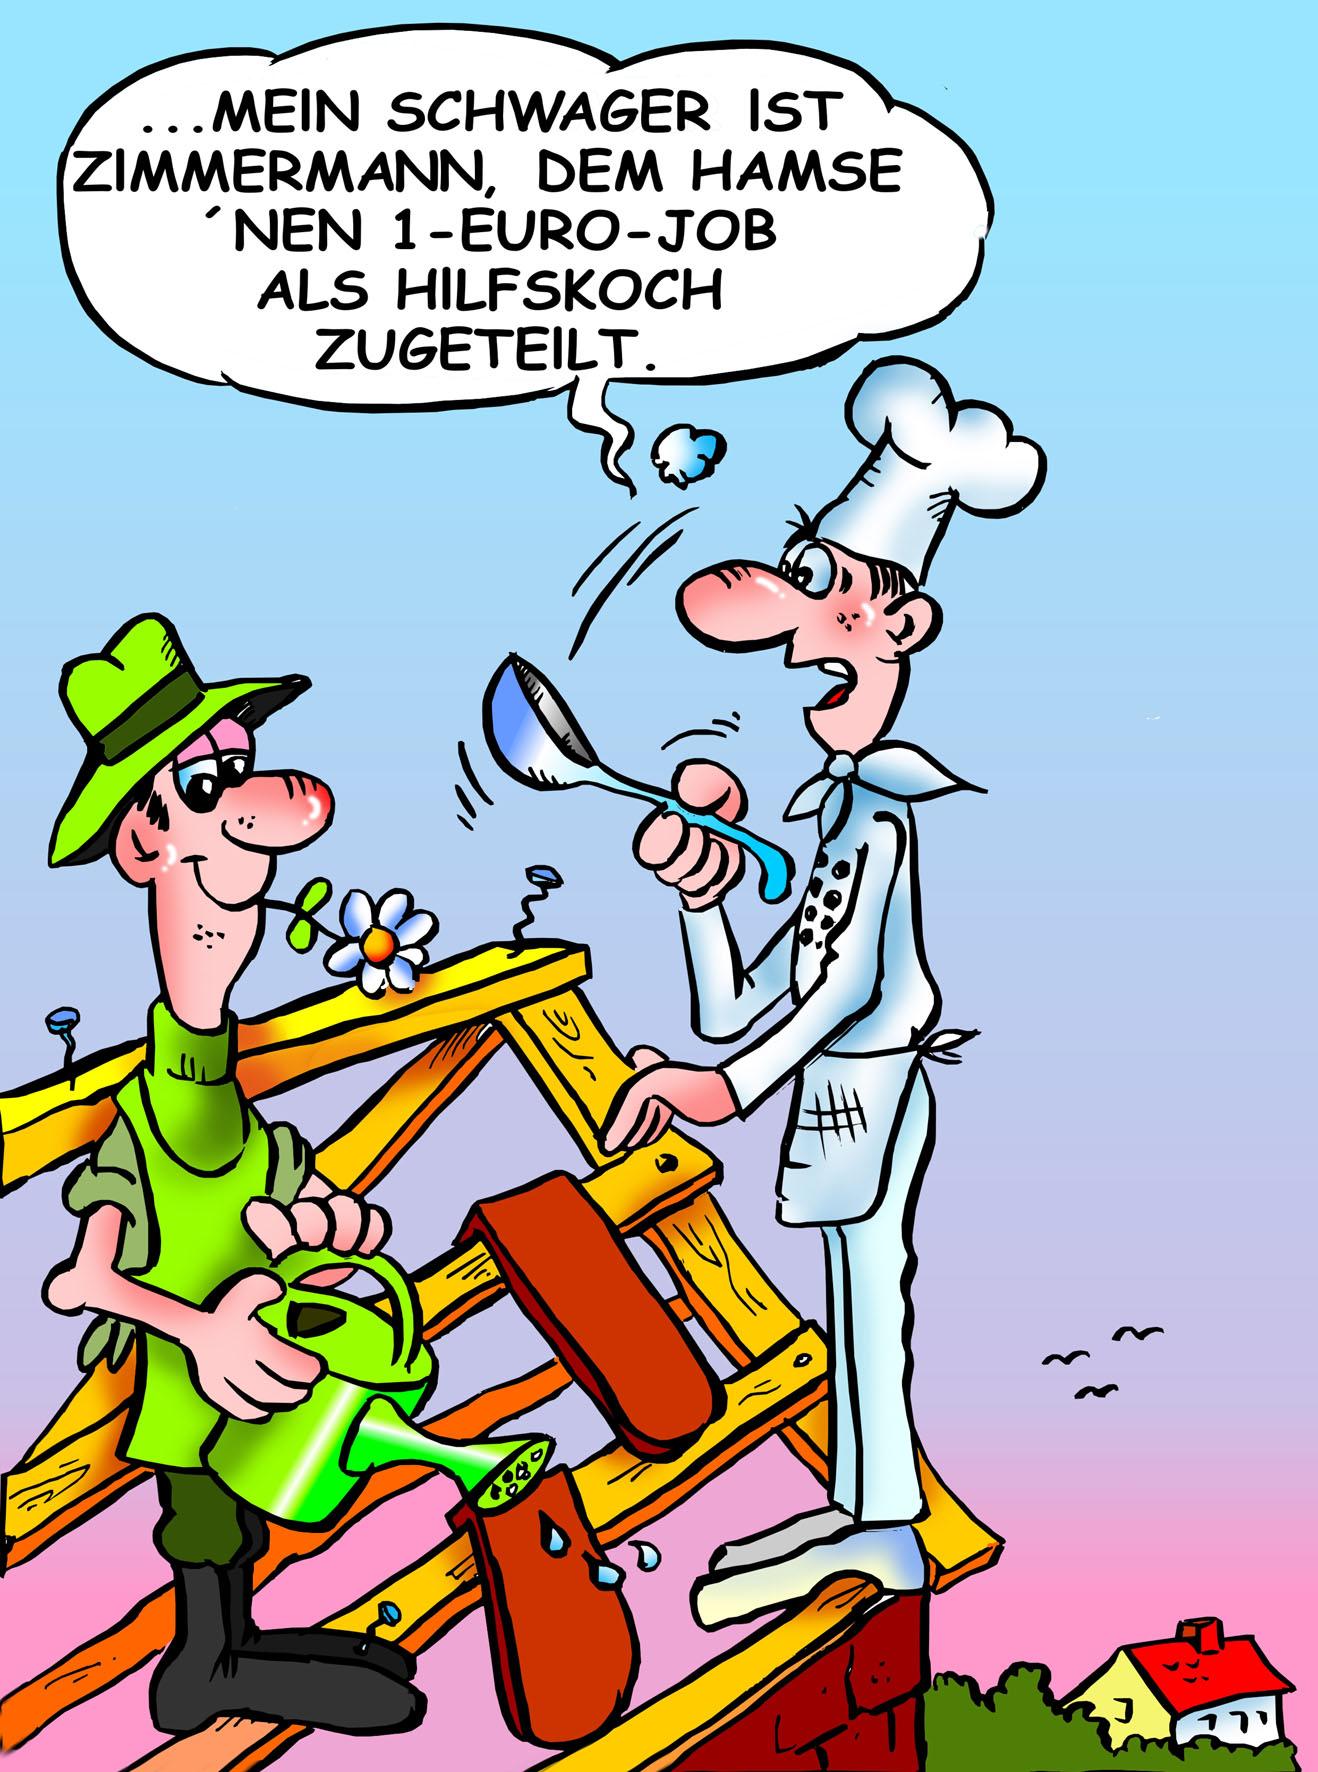 euro-job